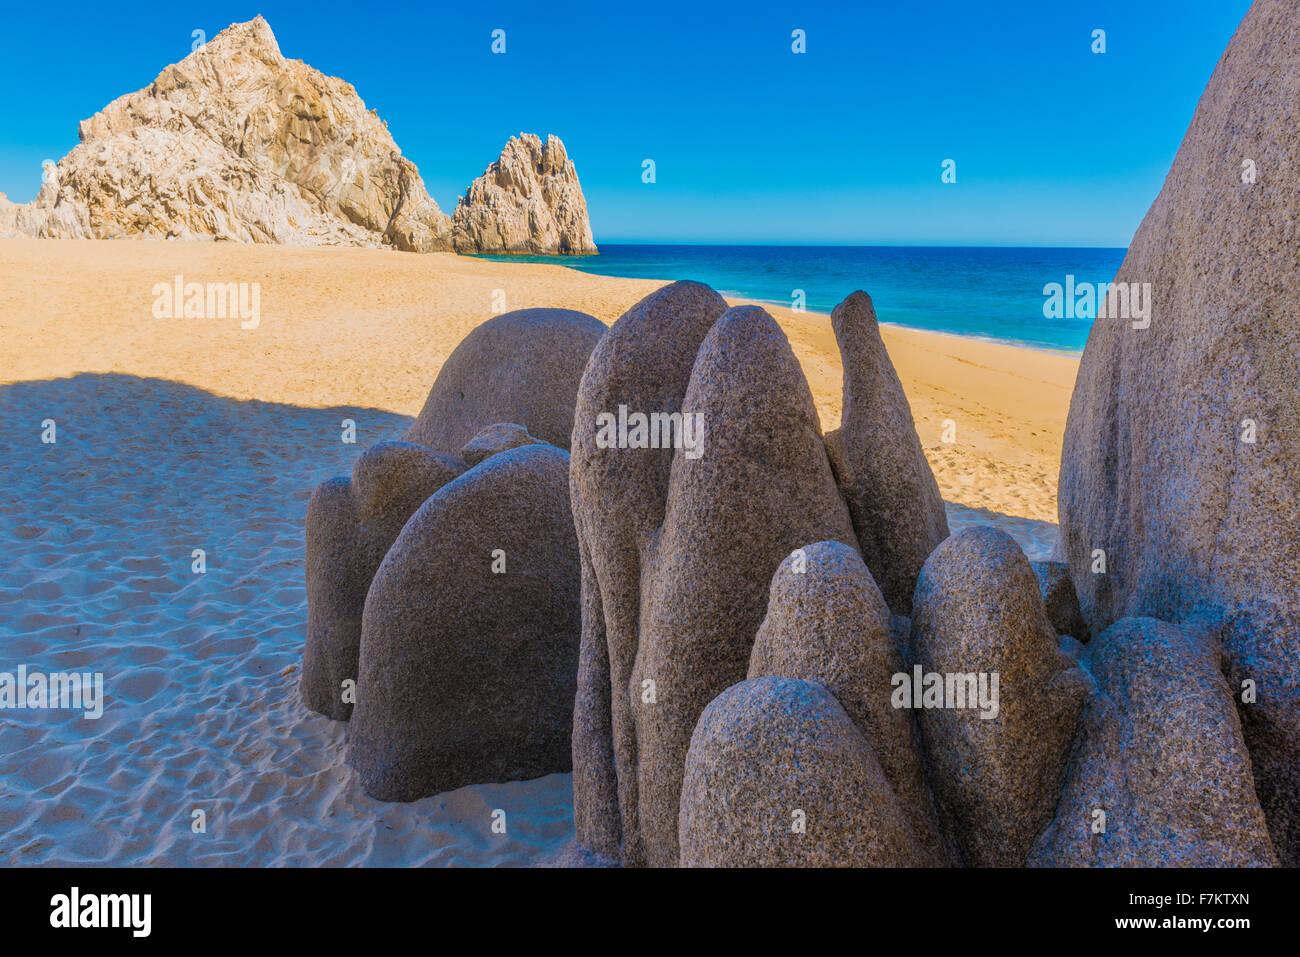 Granite forms at Divorce Beach, Baja California, Mexico, Land's End, Tip of Baja Pennisula at Cabo San Lucas - Stock Image